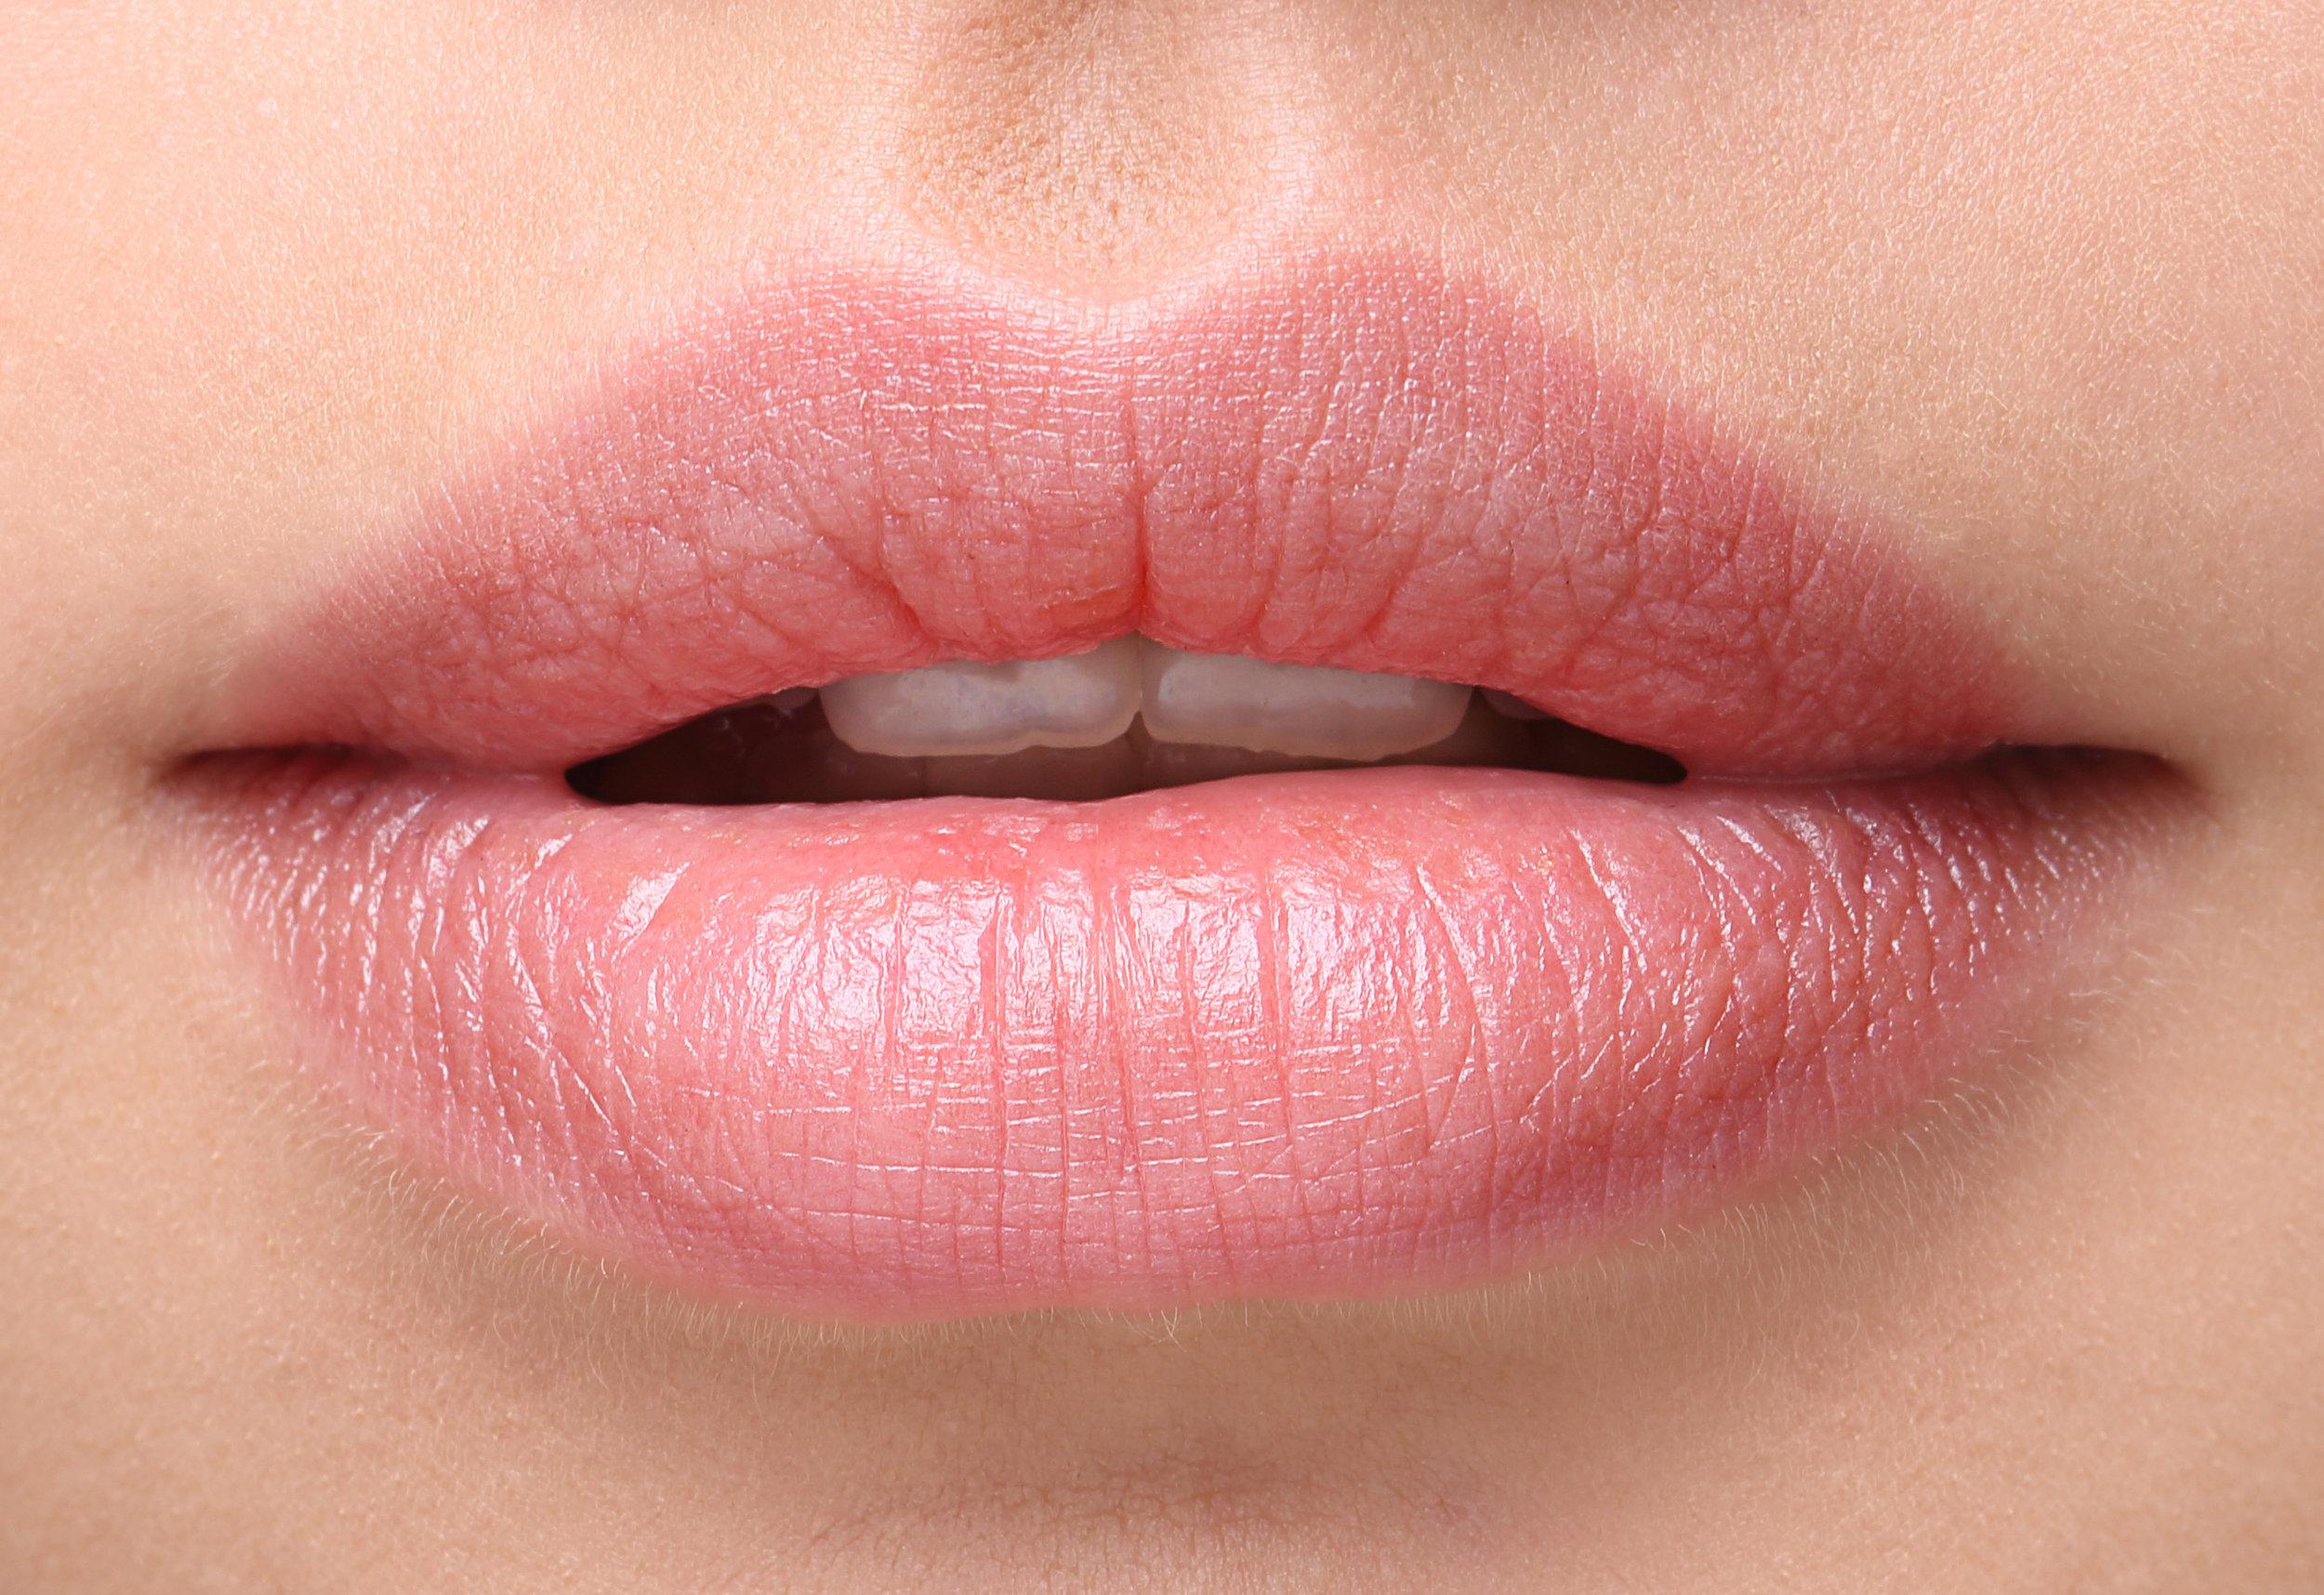 Lip plumping routine with Smoocheroo Mega Lip Plumper